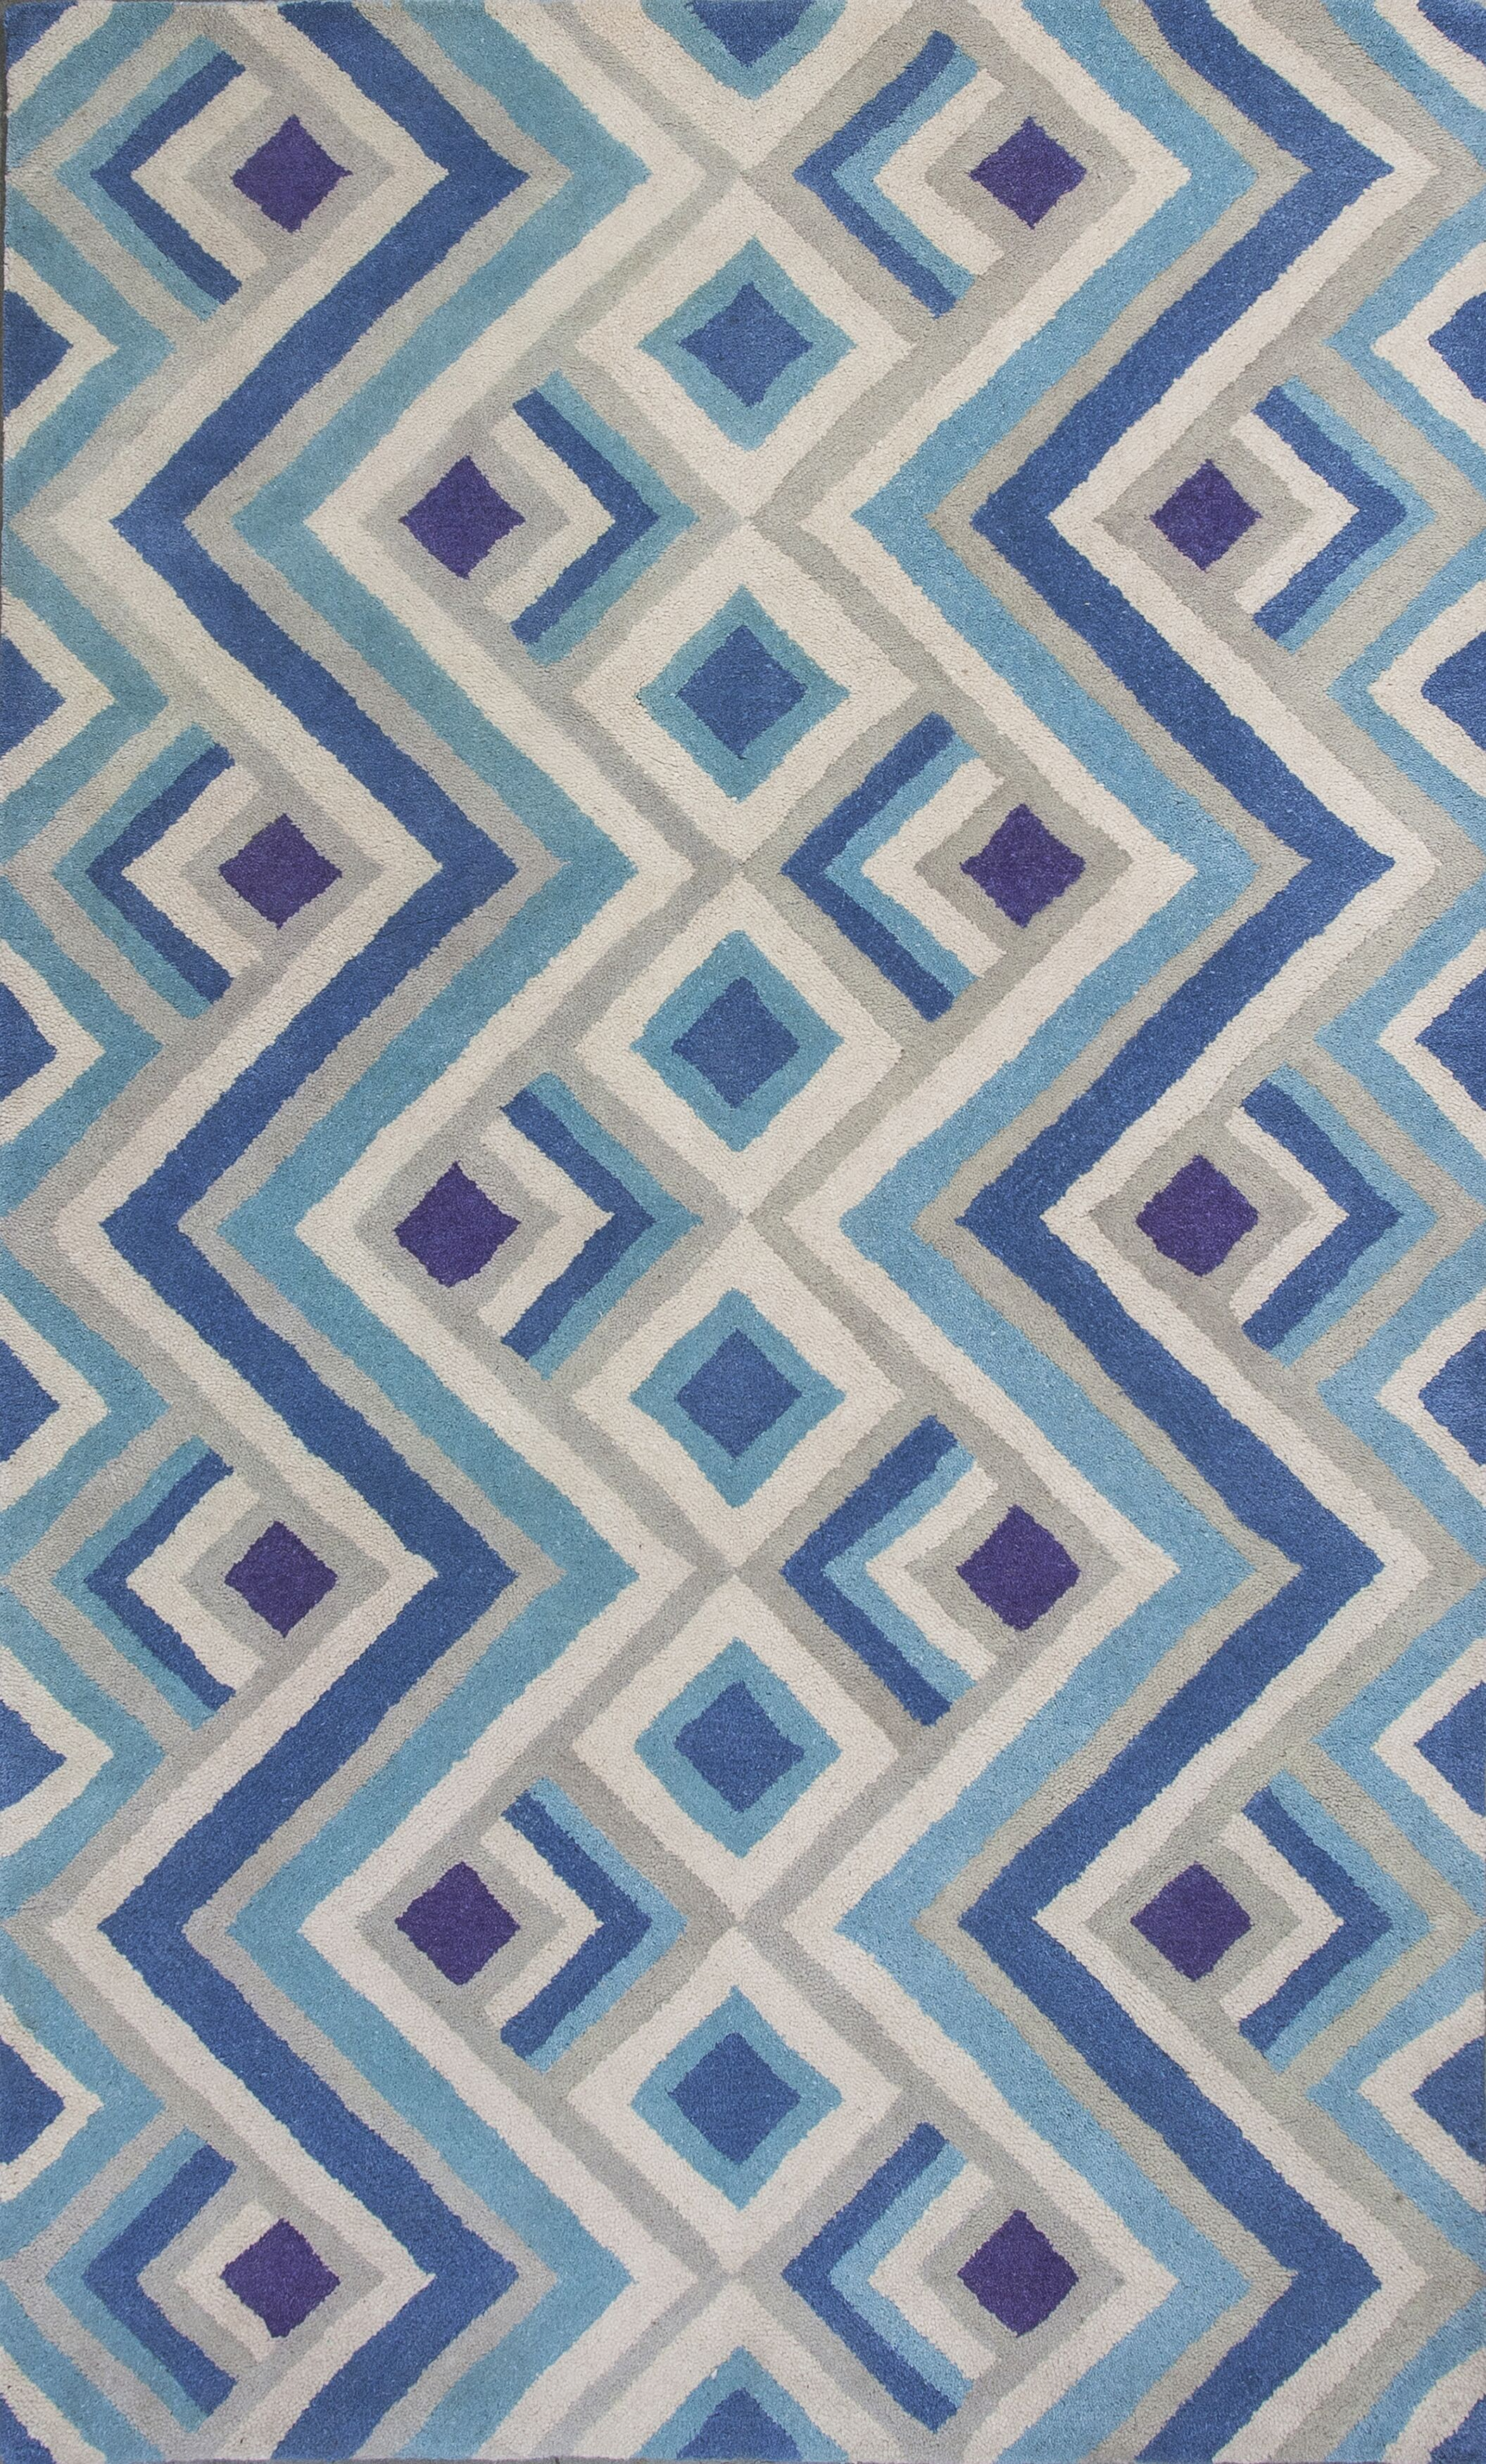 Harmony Ivory/Blue Area Rug Rug Size: Rectangle 3'3